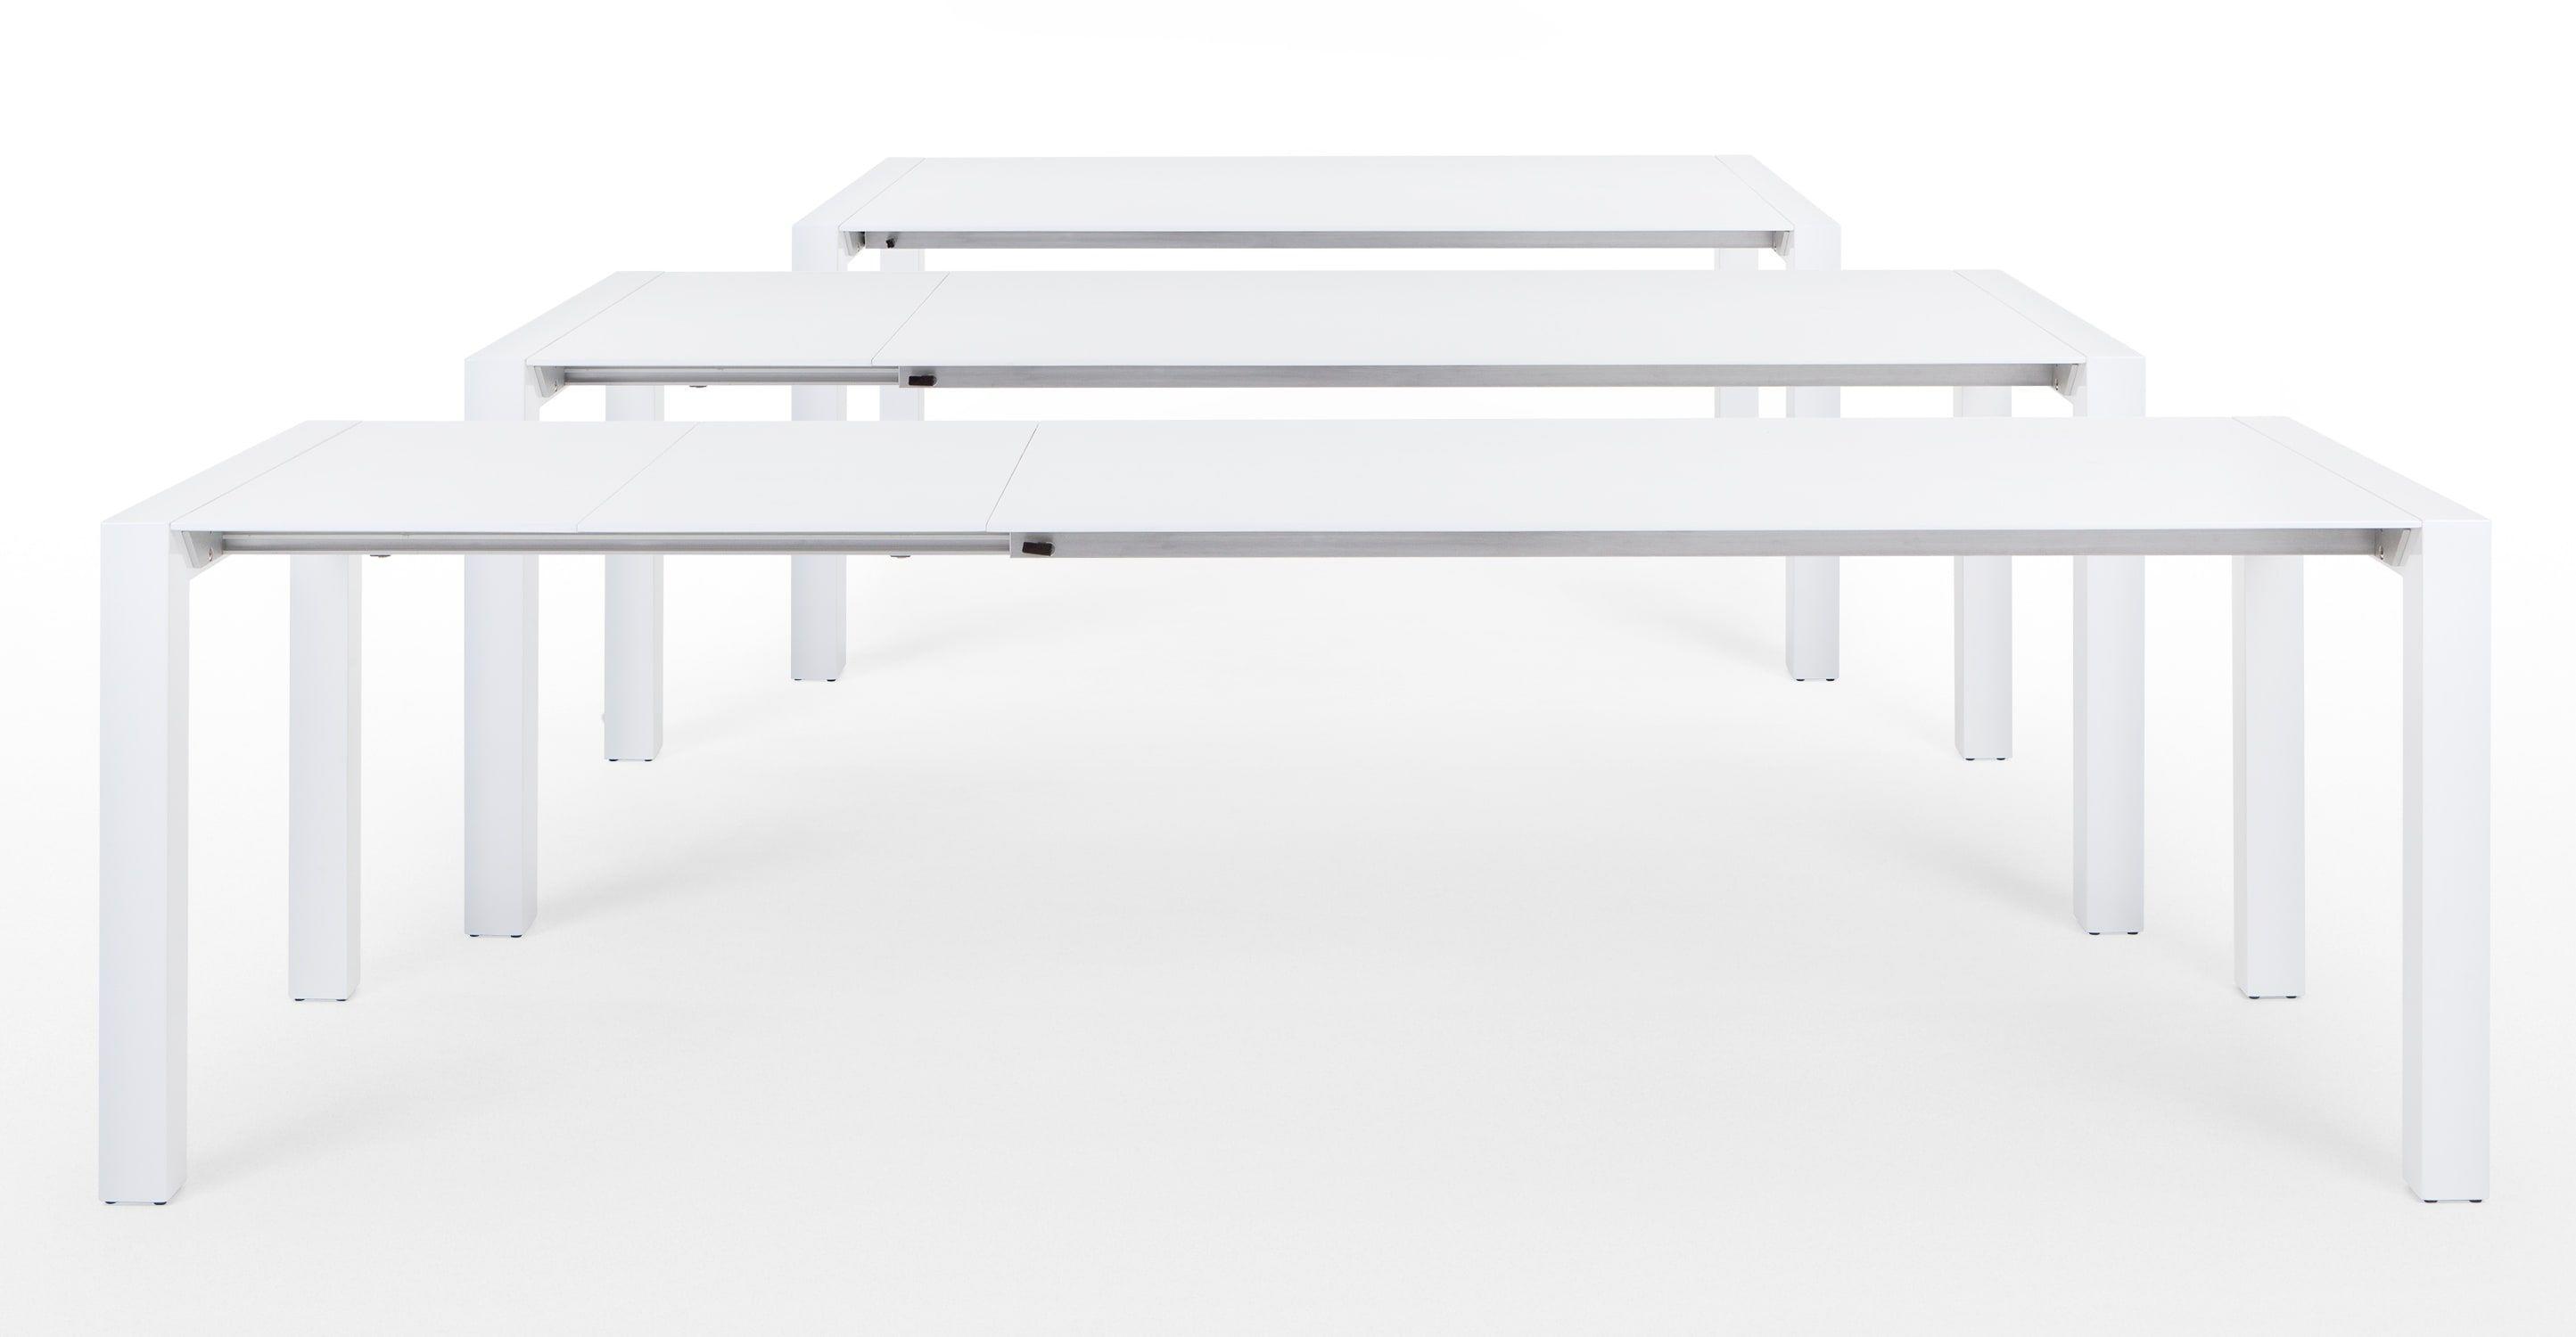 Moderne Uitschuifbare Eetkamertafels.Bramante Uitschuifbare Eettafel Wit Eettafels White Dining